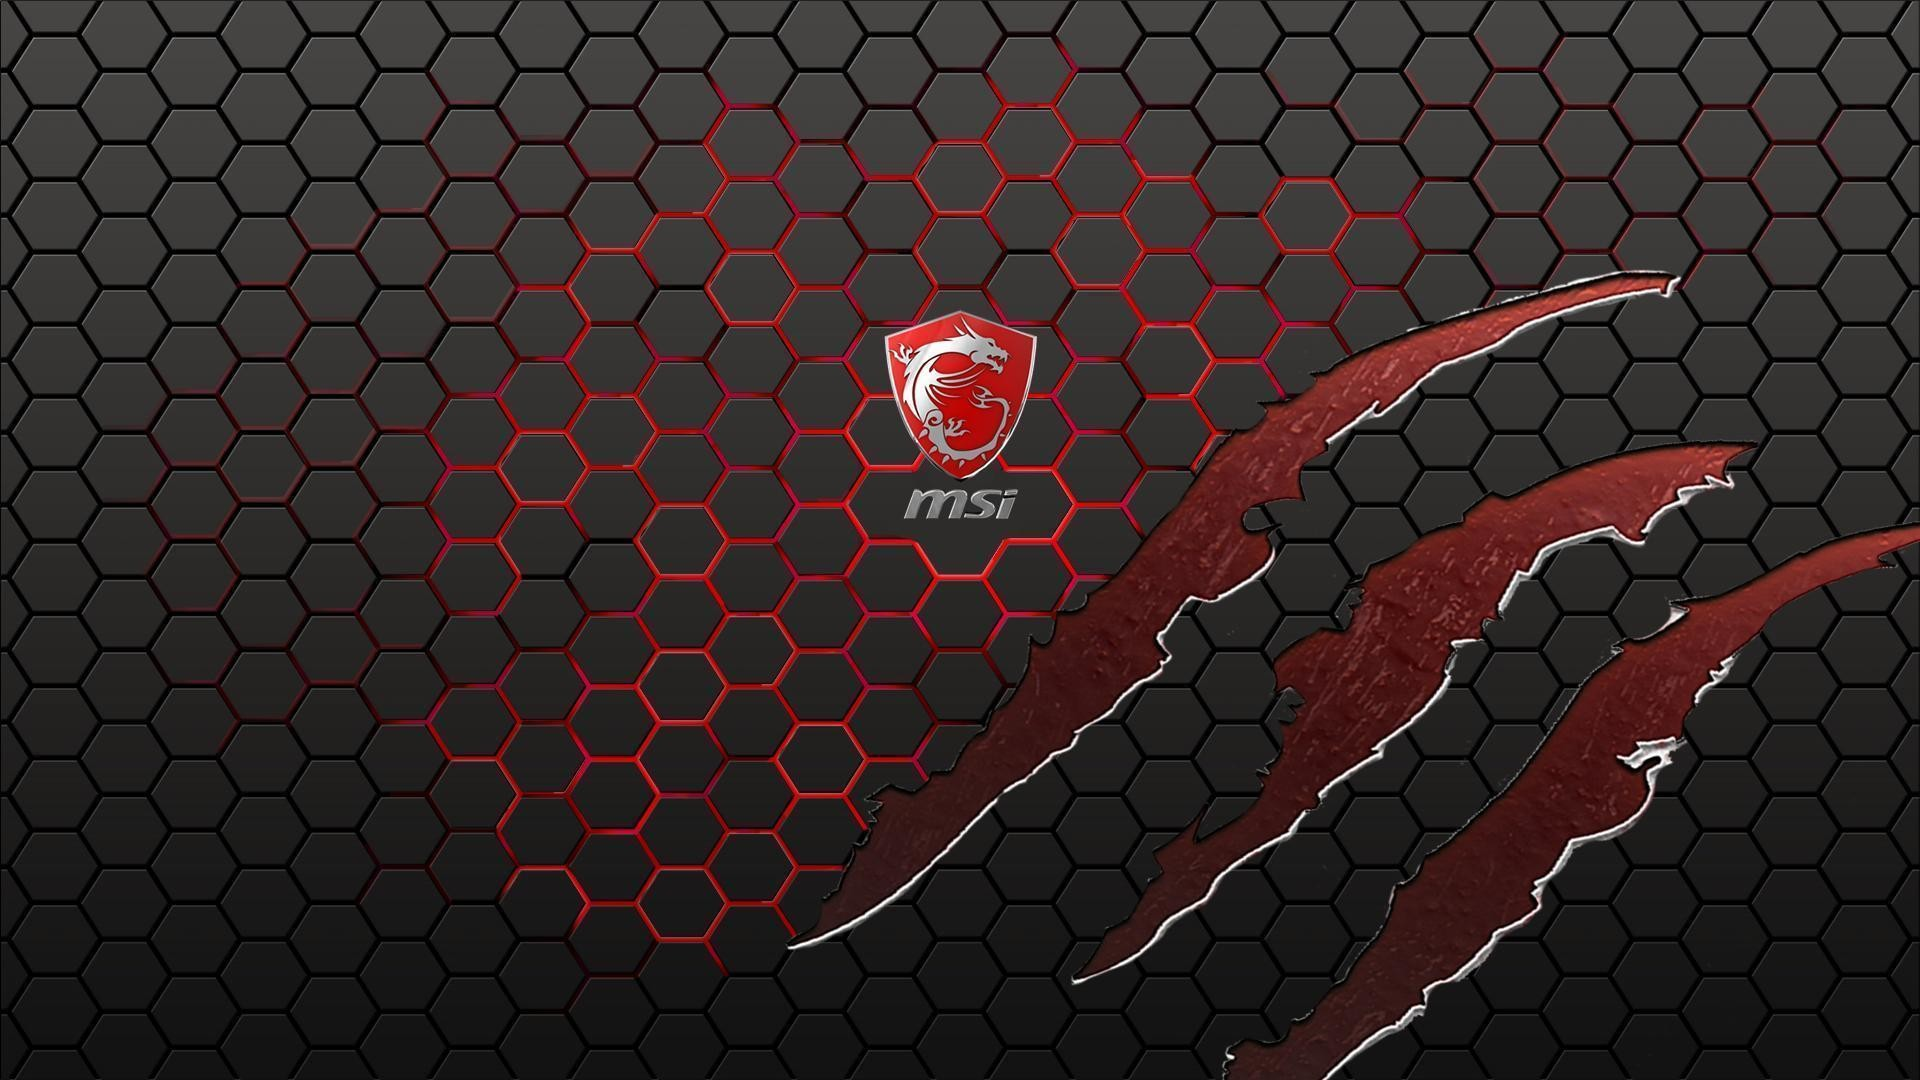 Msi desktop wallpaper 83 images 1920x1080 msi wallpaper hd voltagebd Images